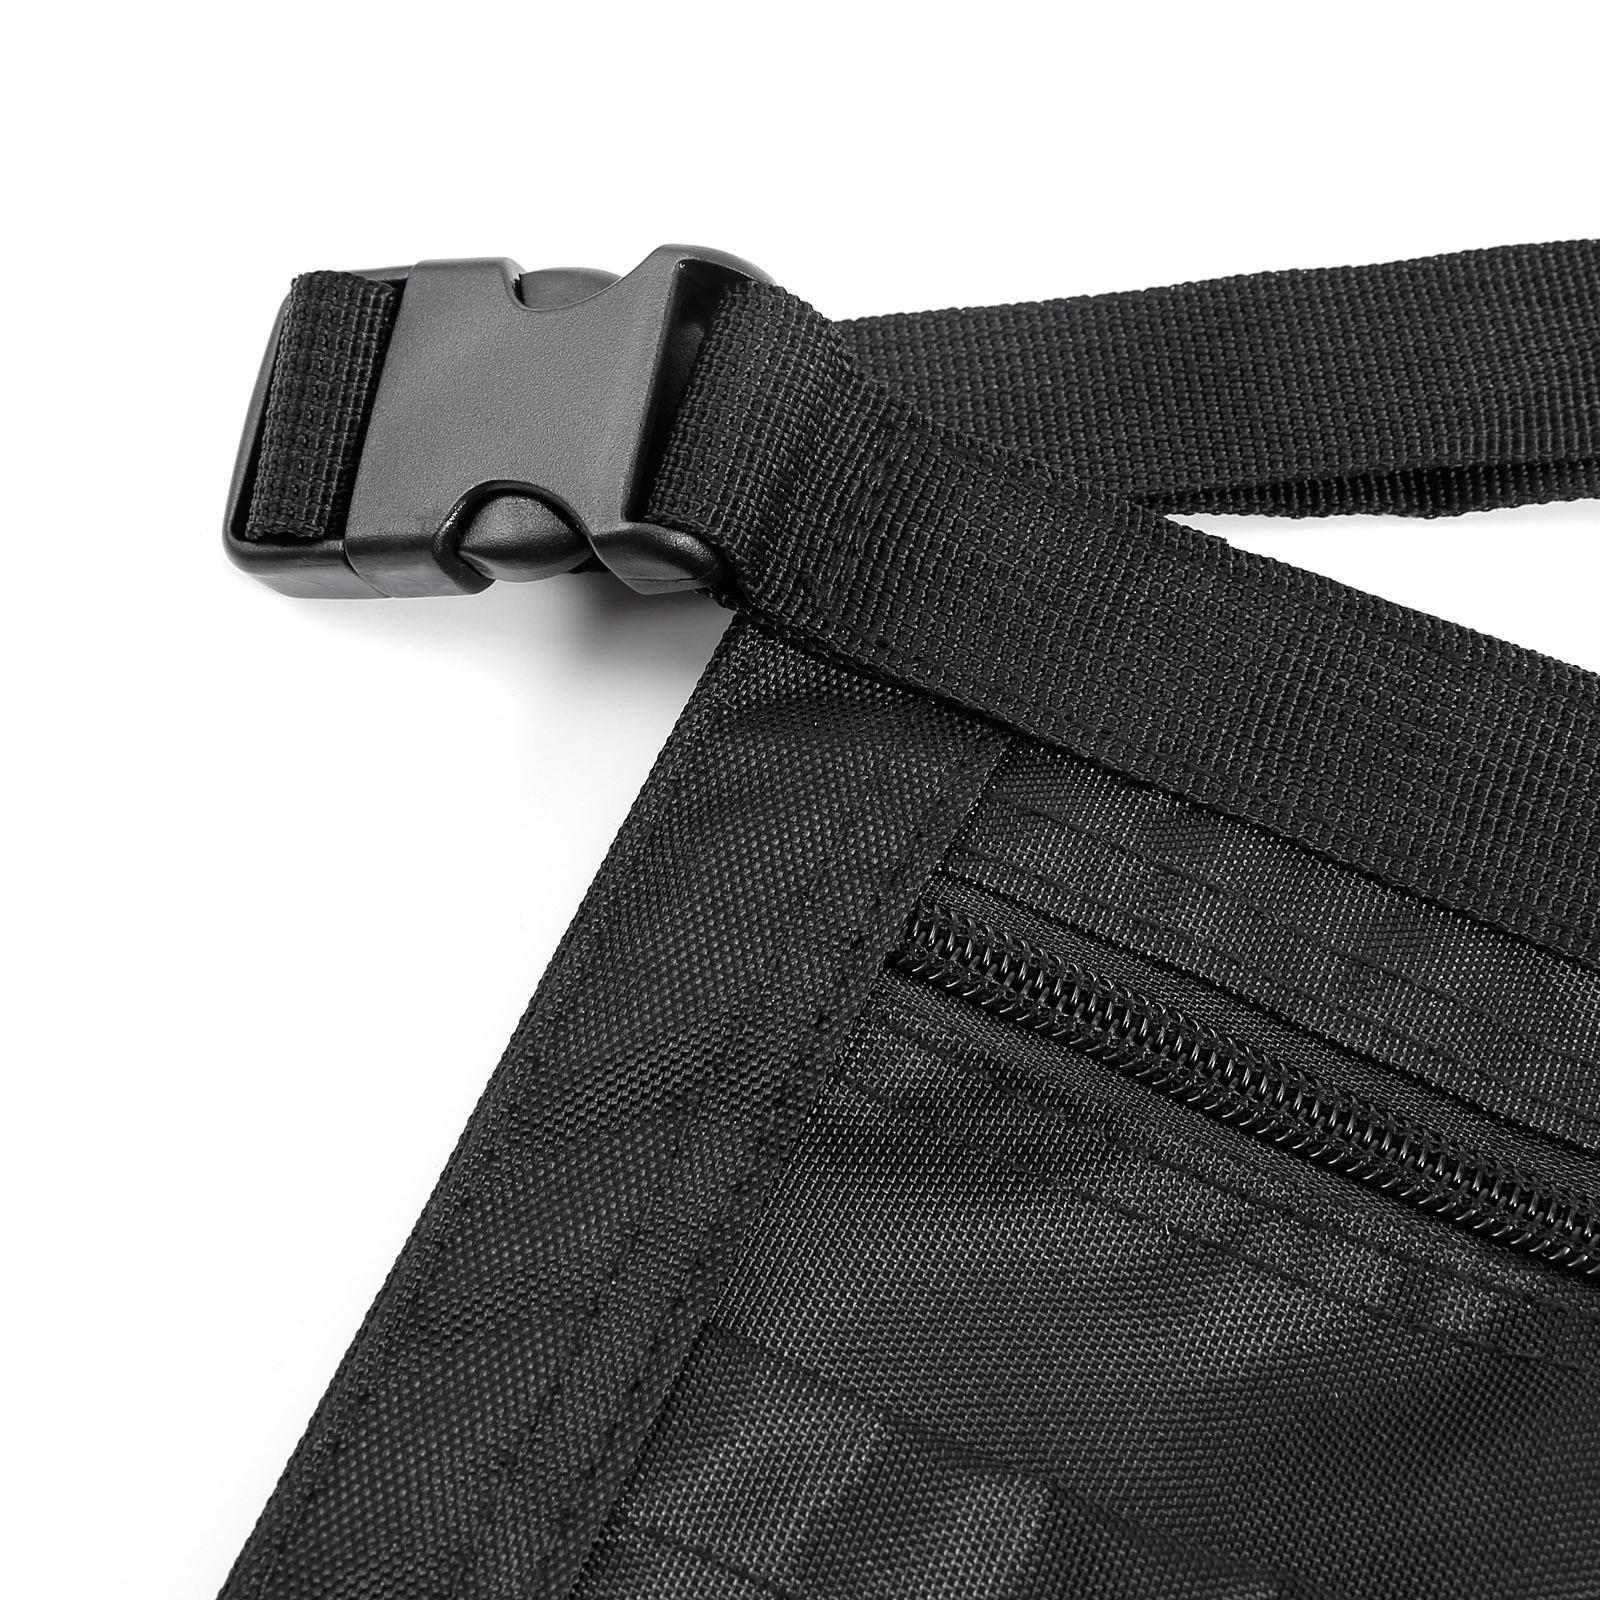 White lace apron ebay - Denim Market Trader Money Belt Bag Apron Pouch Adjustable Waist Strap 4 Pocket